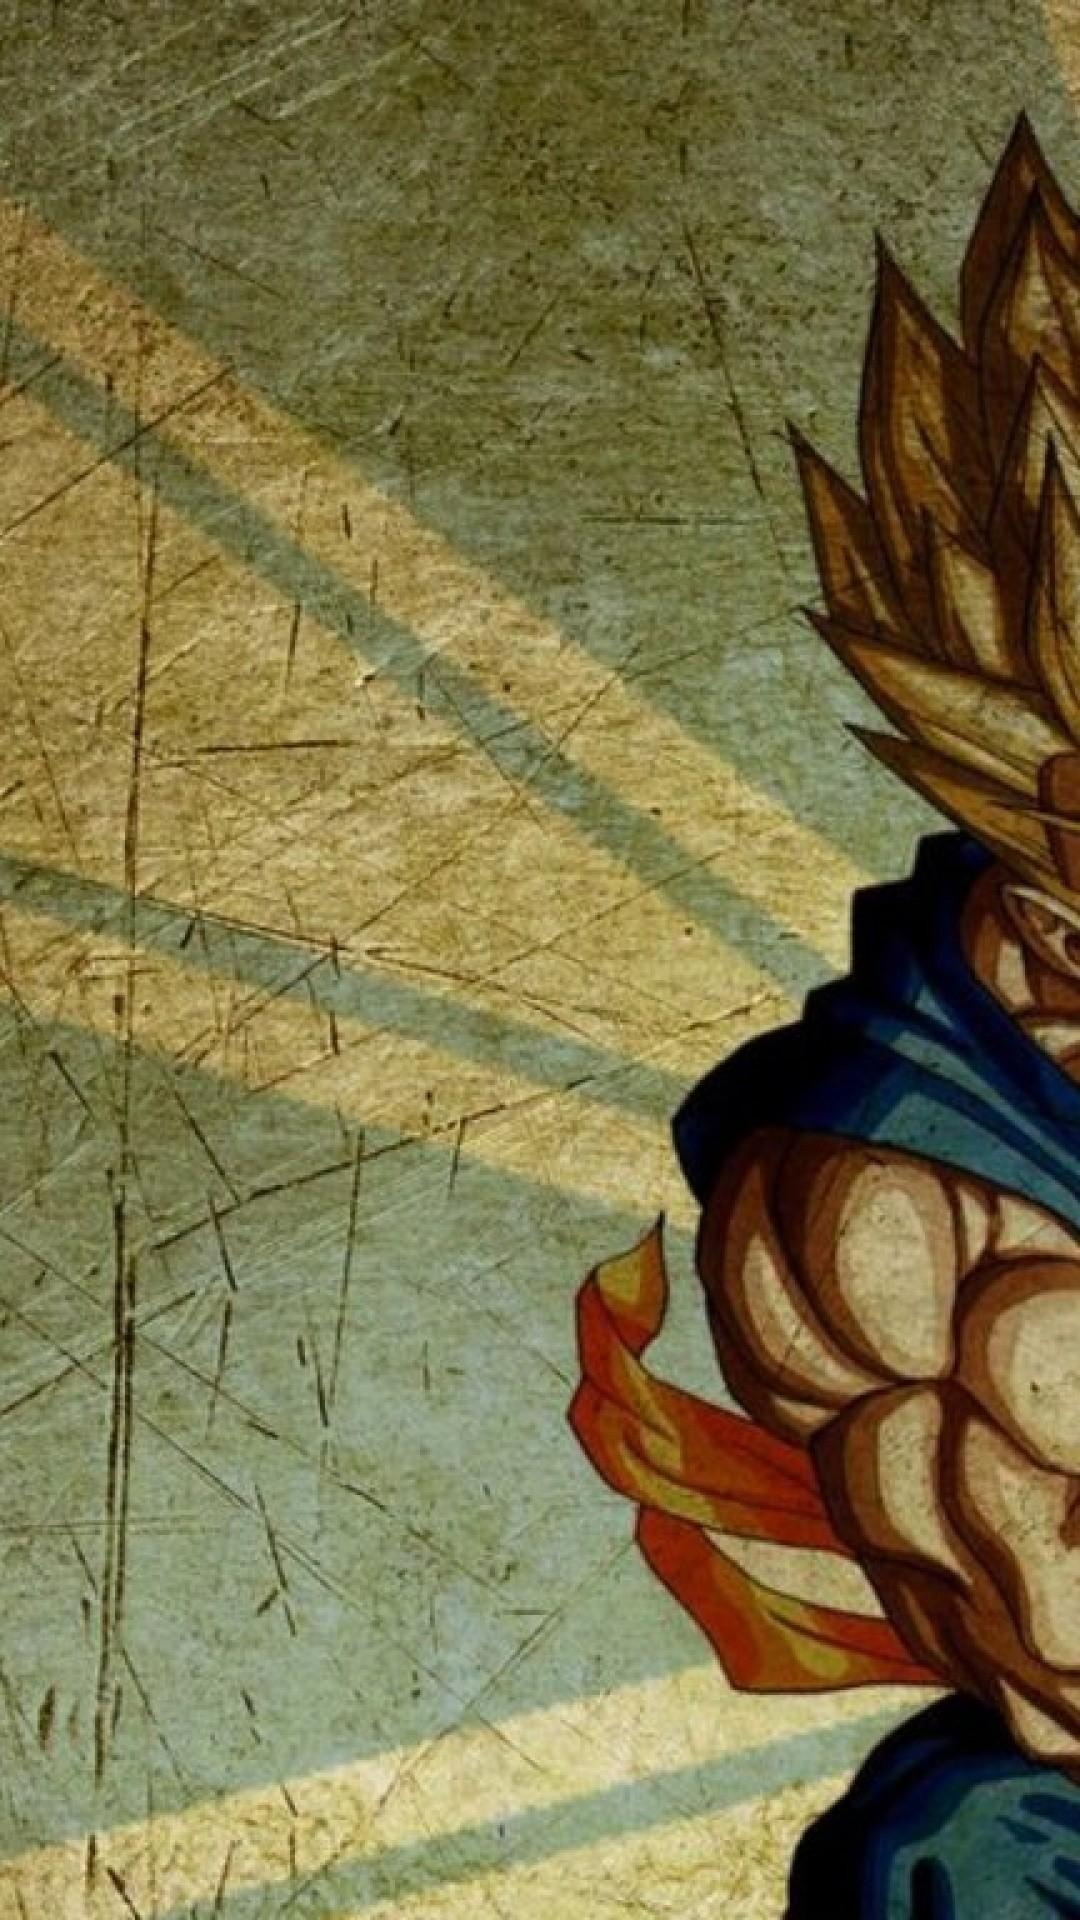 Iphone Dragon Ball Wallpaper Goku 1080x1920 Wallpaper Teahub Io